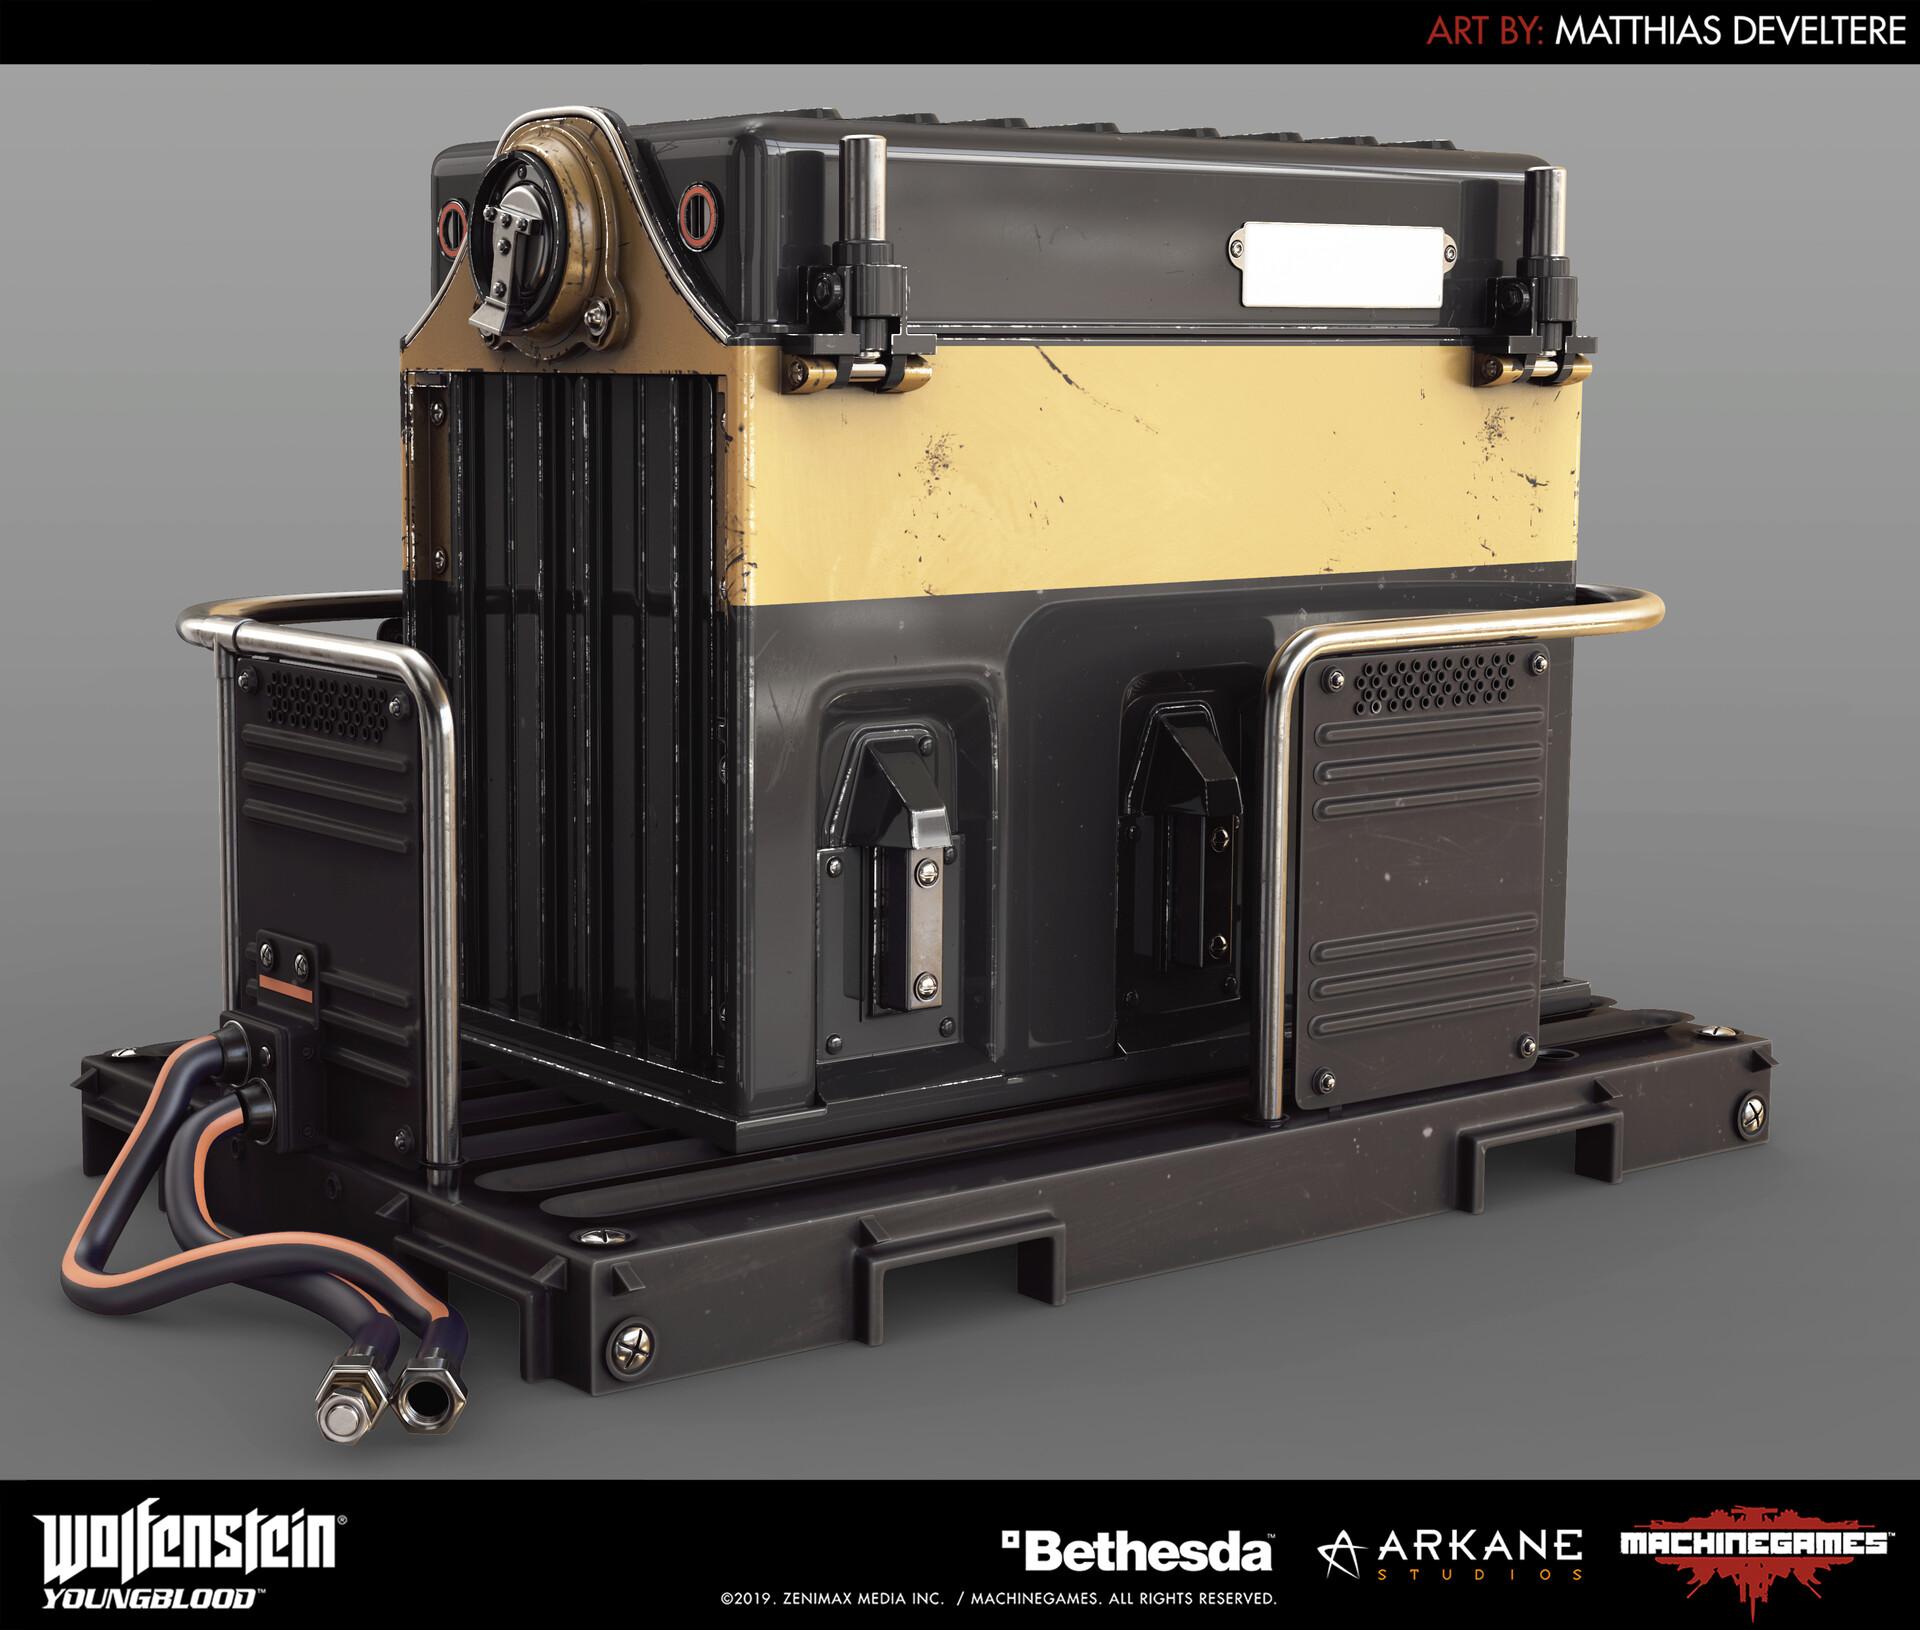 Matthias develtere crate 4